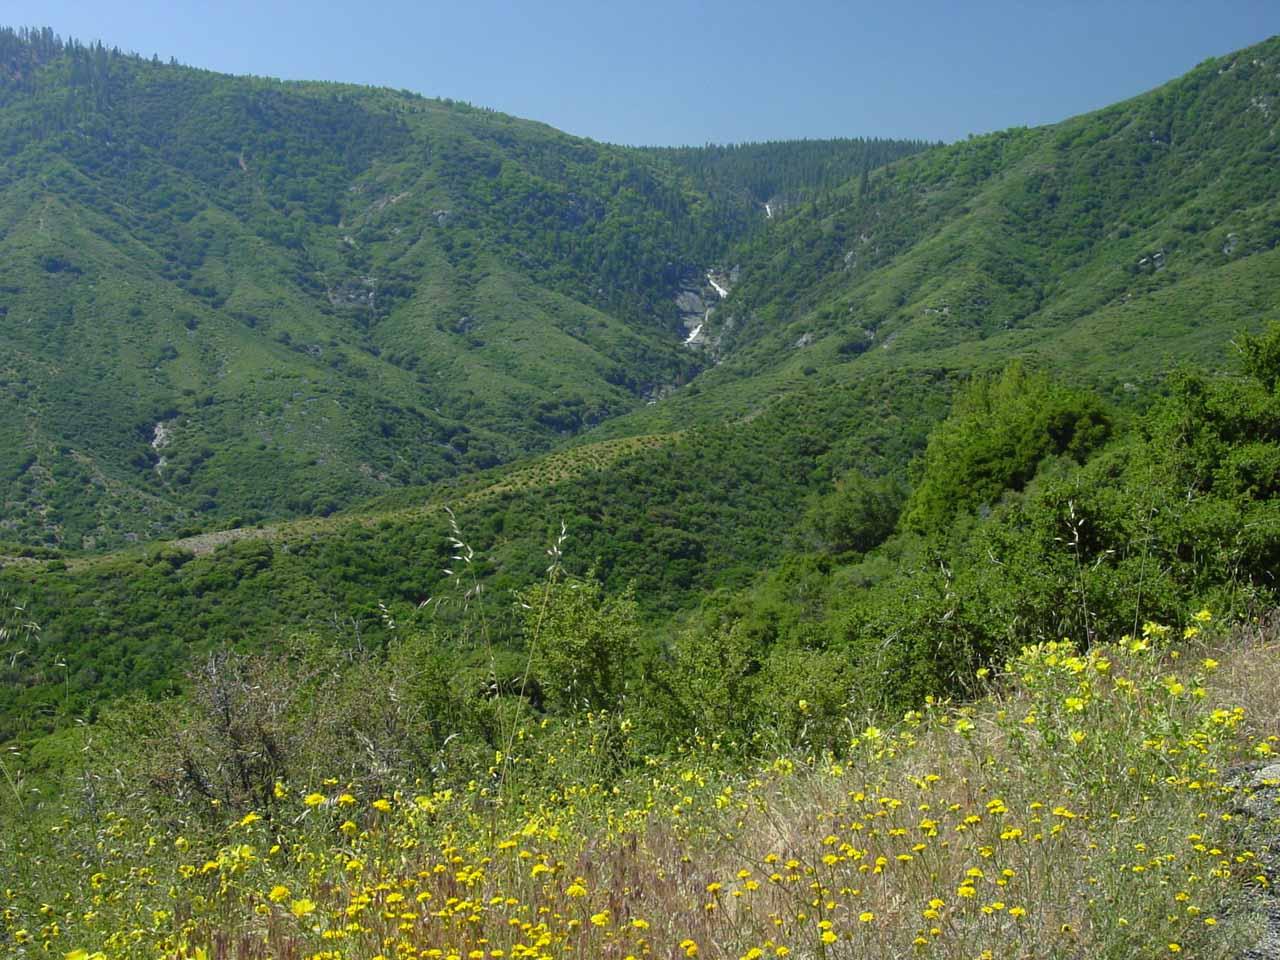 Wildflowers blooming before the cascade on Ten Mile Creek